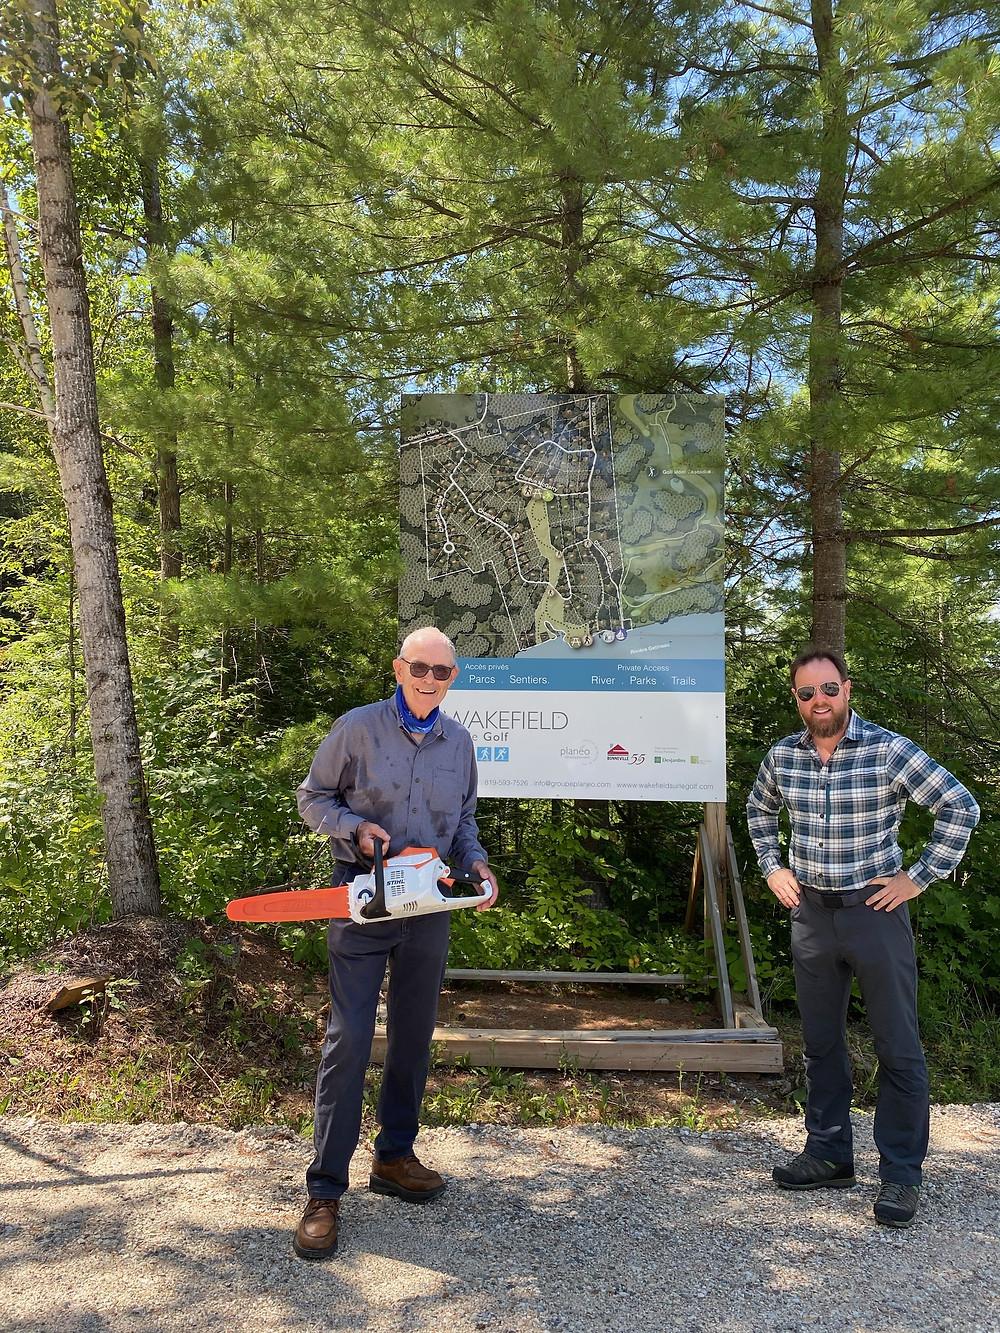 Left, Ken Bouchard, Sentiers Wakefield Trails president, with Louis Charles Touchet, a partner at Wakefield sur le Golf Development. Photo courtesy Ken Bouchard